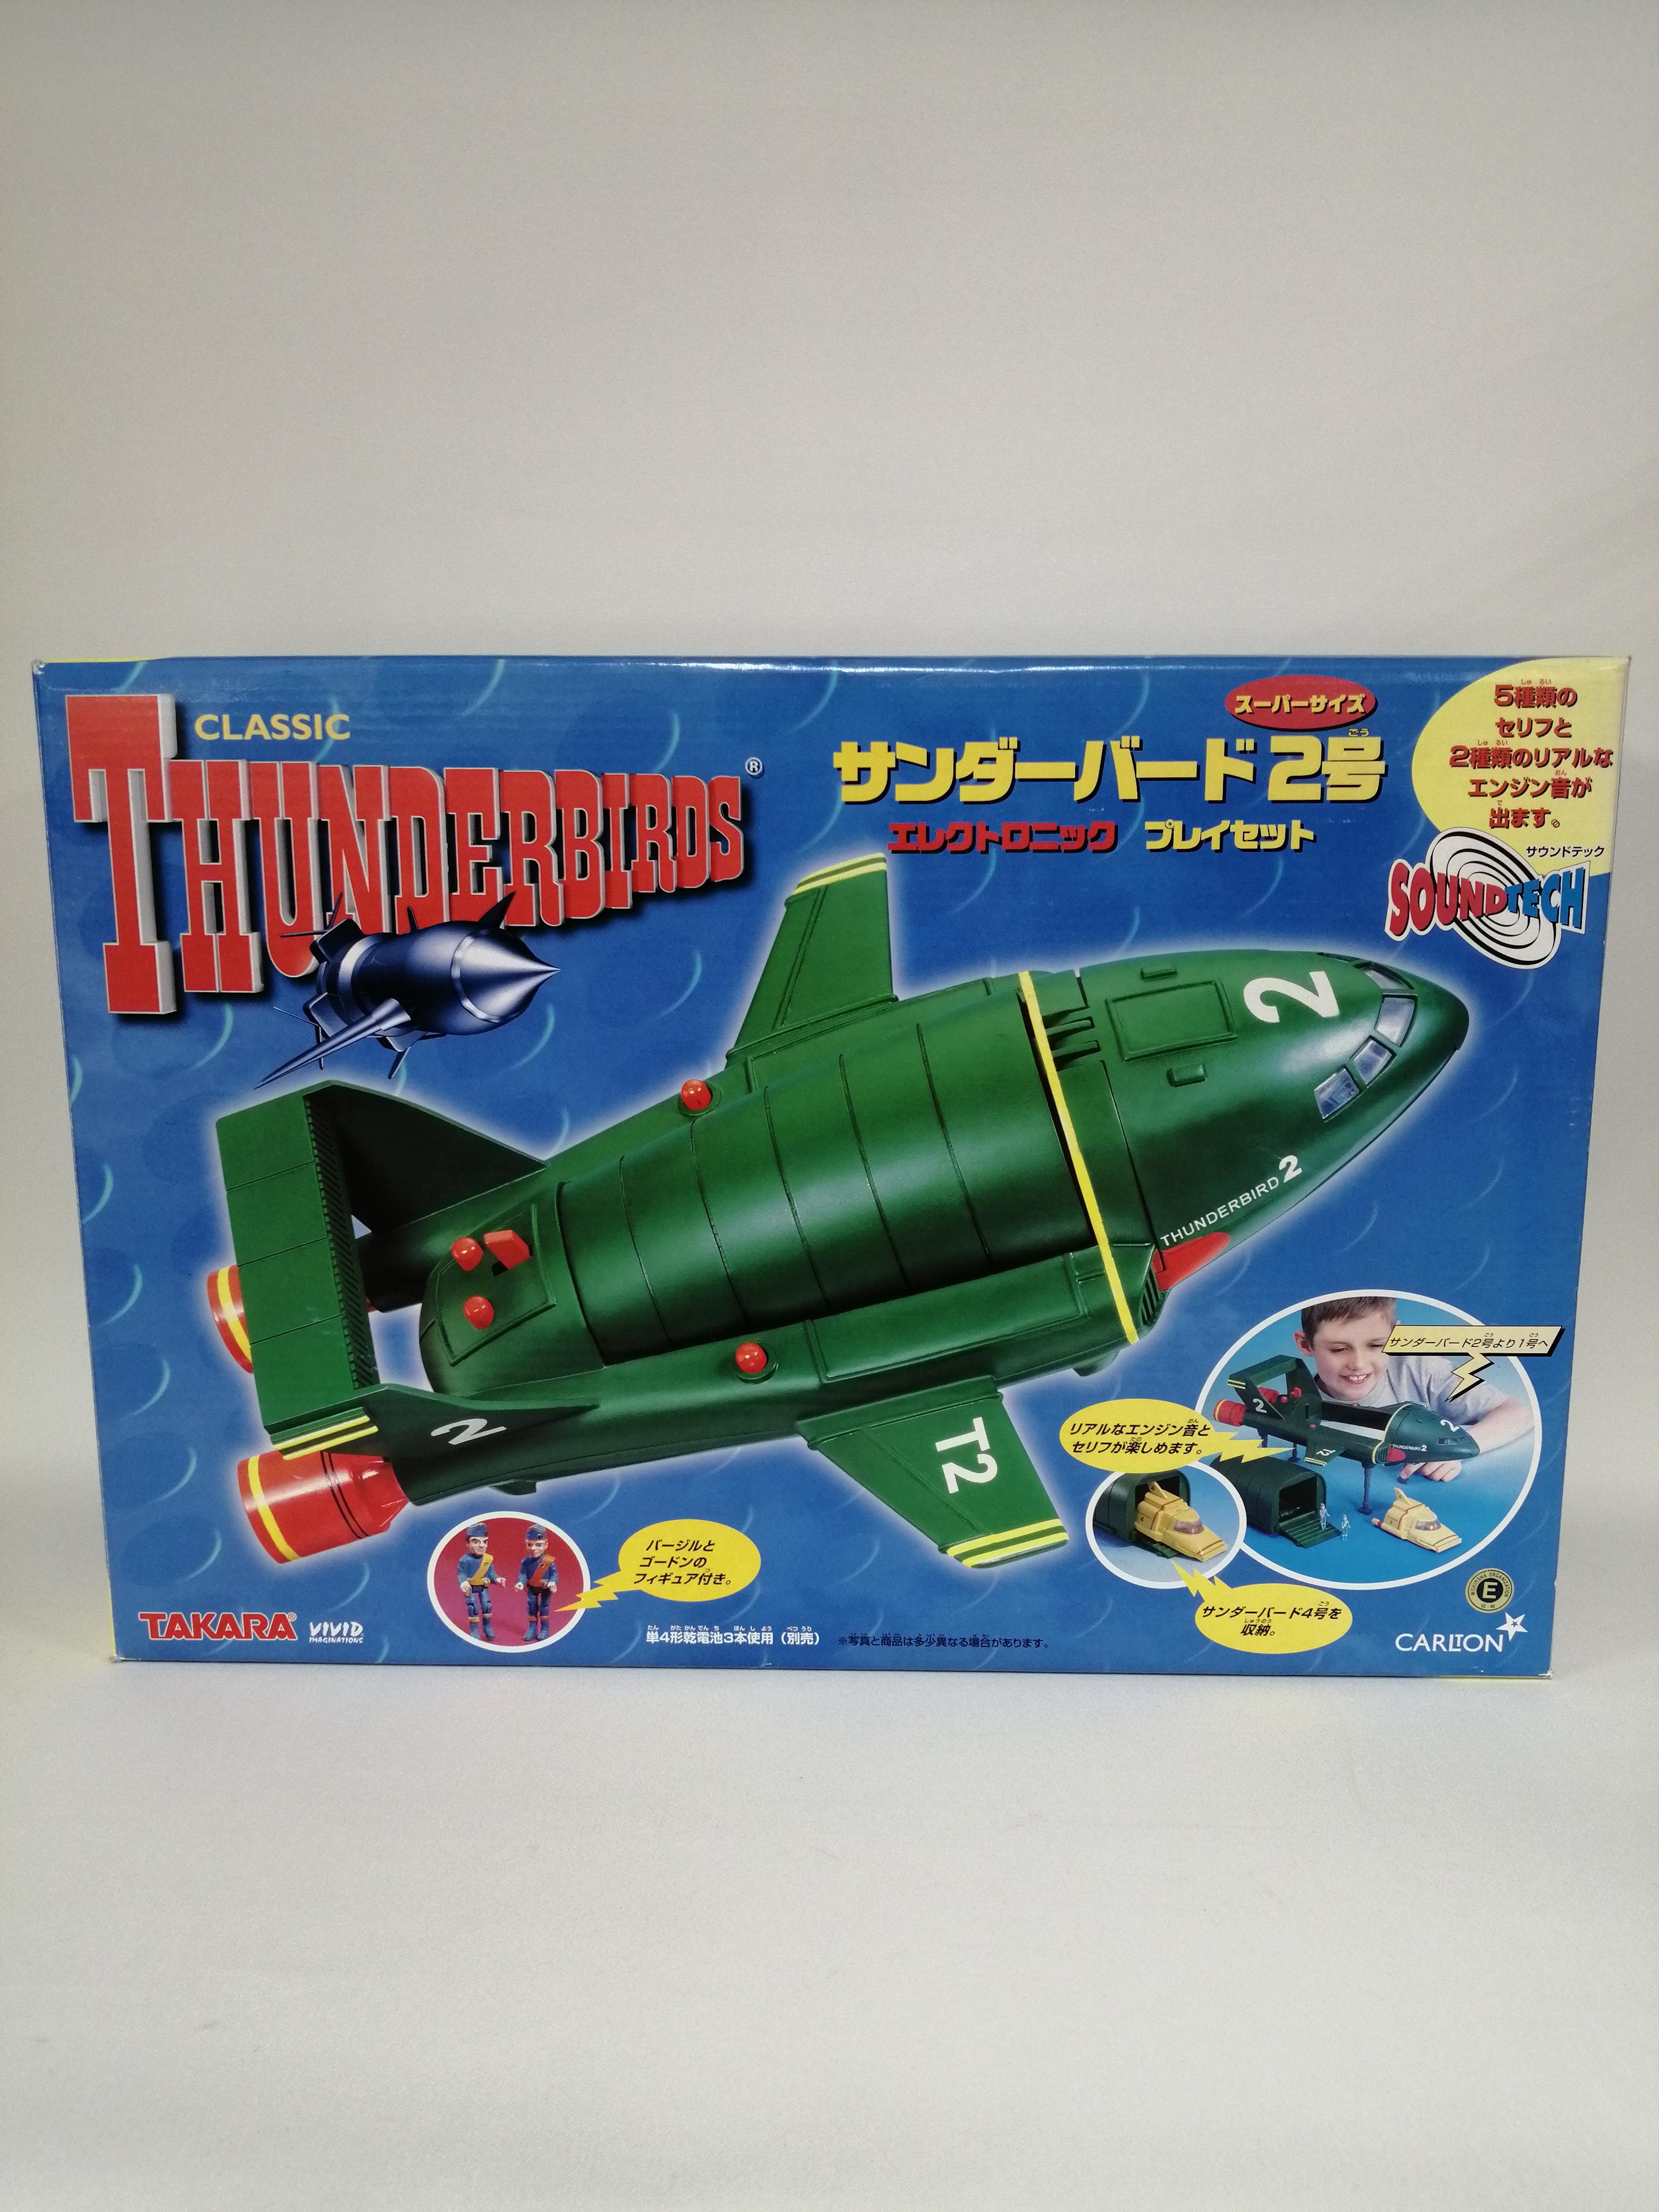 【開封品】CLASSIC THUNDERBIRDS TAKARA